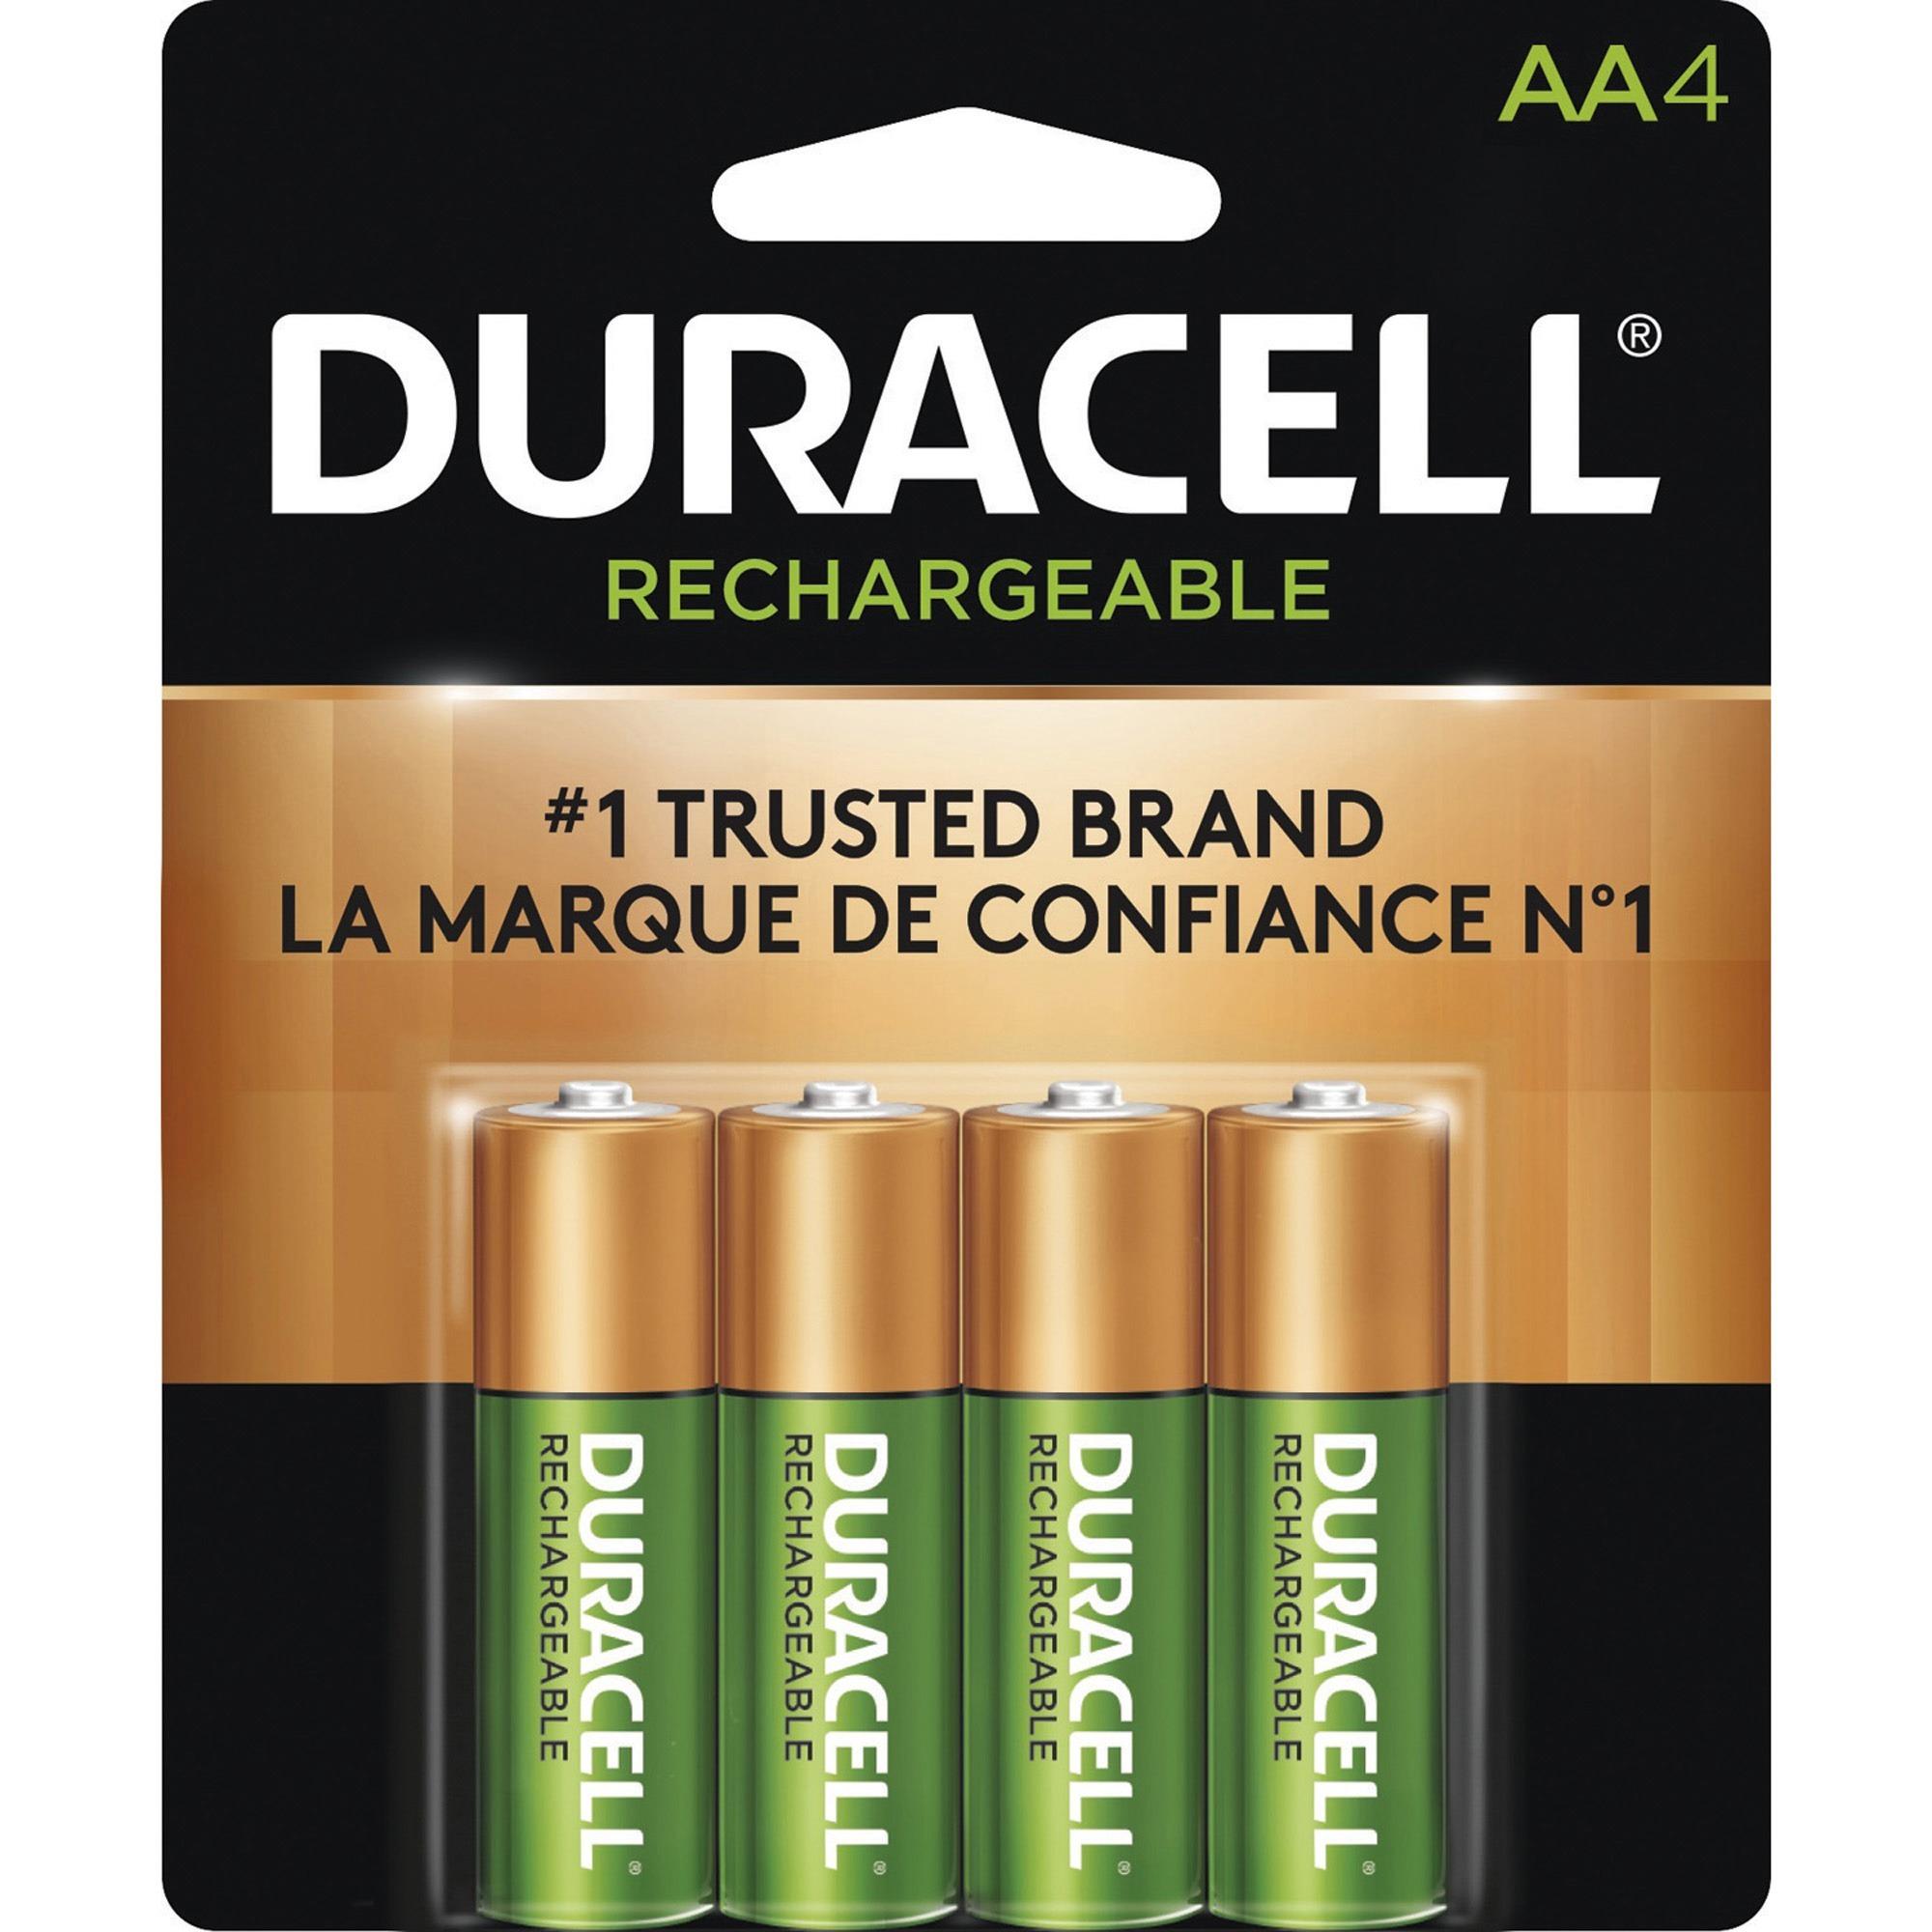 Duracell Dx1500 General Purpose Battery 2000 Mah Aa Nickel Metal Hydride Nimh 1 2 V Dc 4 Pack